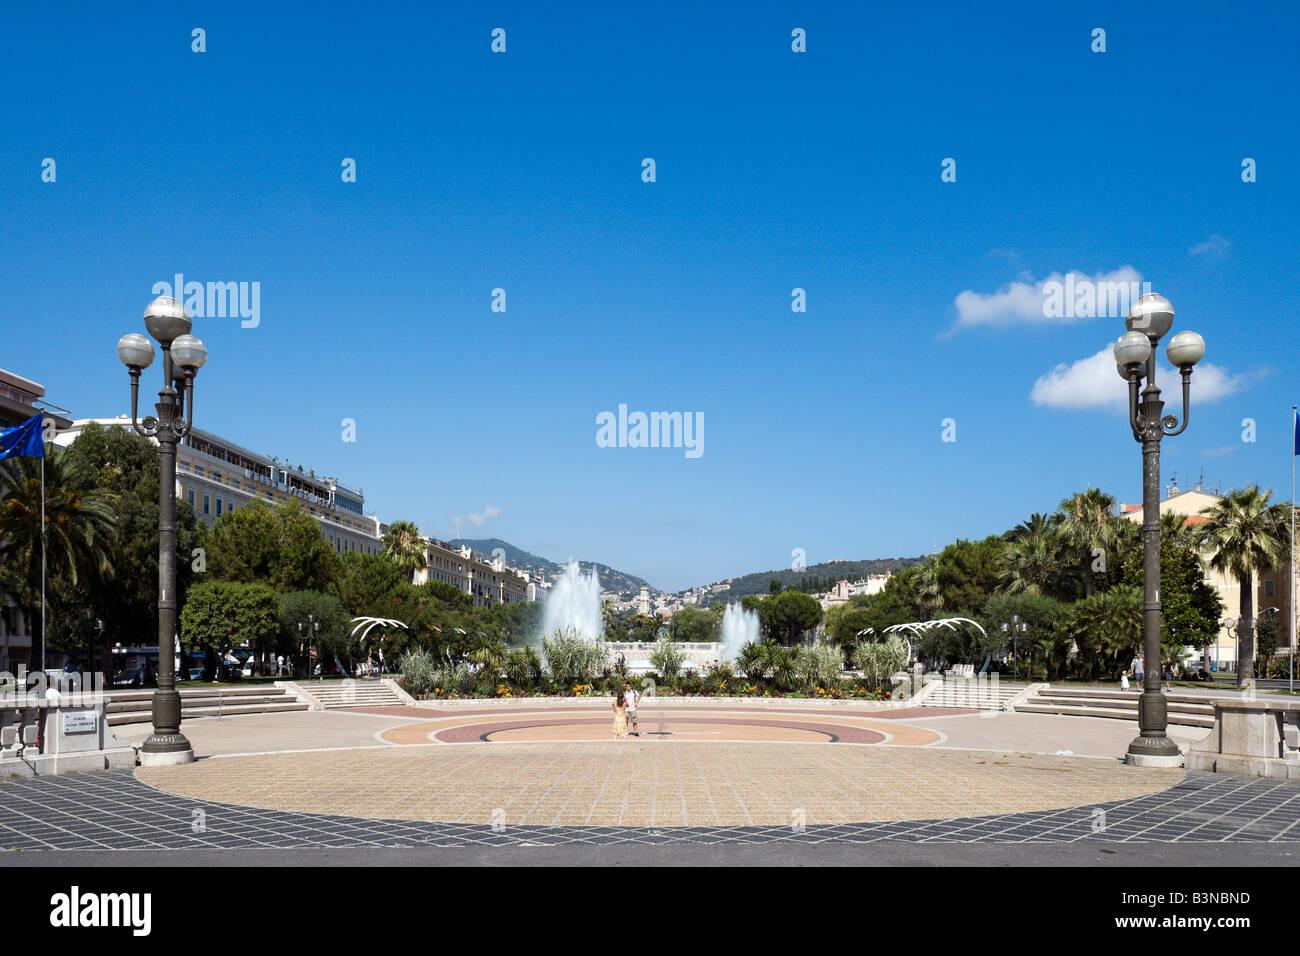 Place Massena, Nice, Cote d'Azur, French Riviera, France - Stock Image